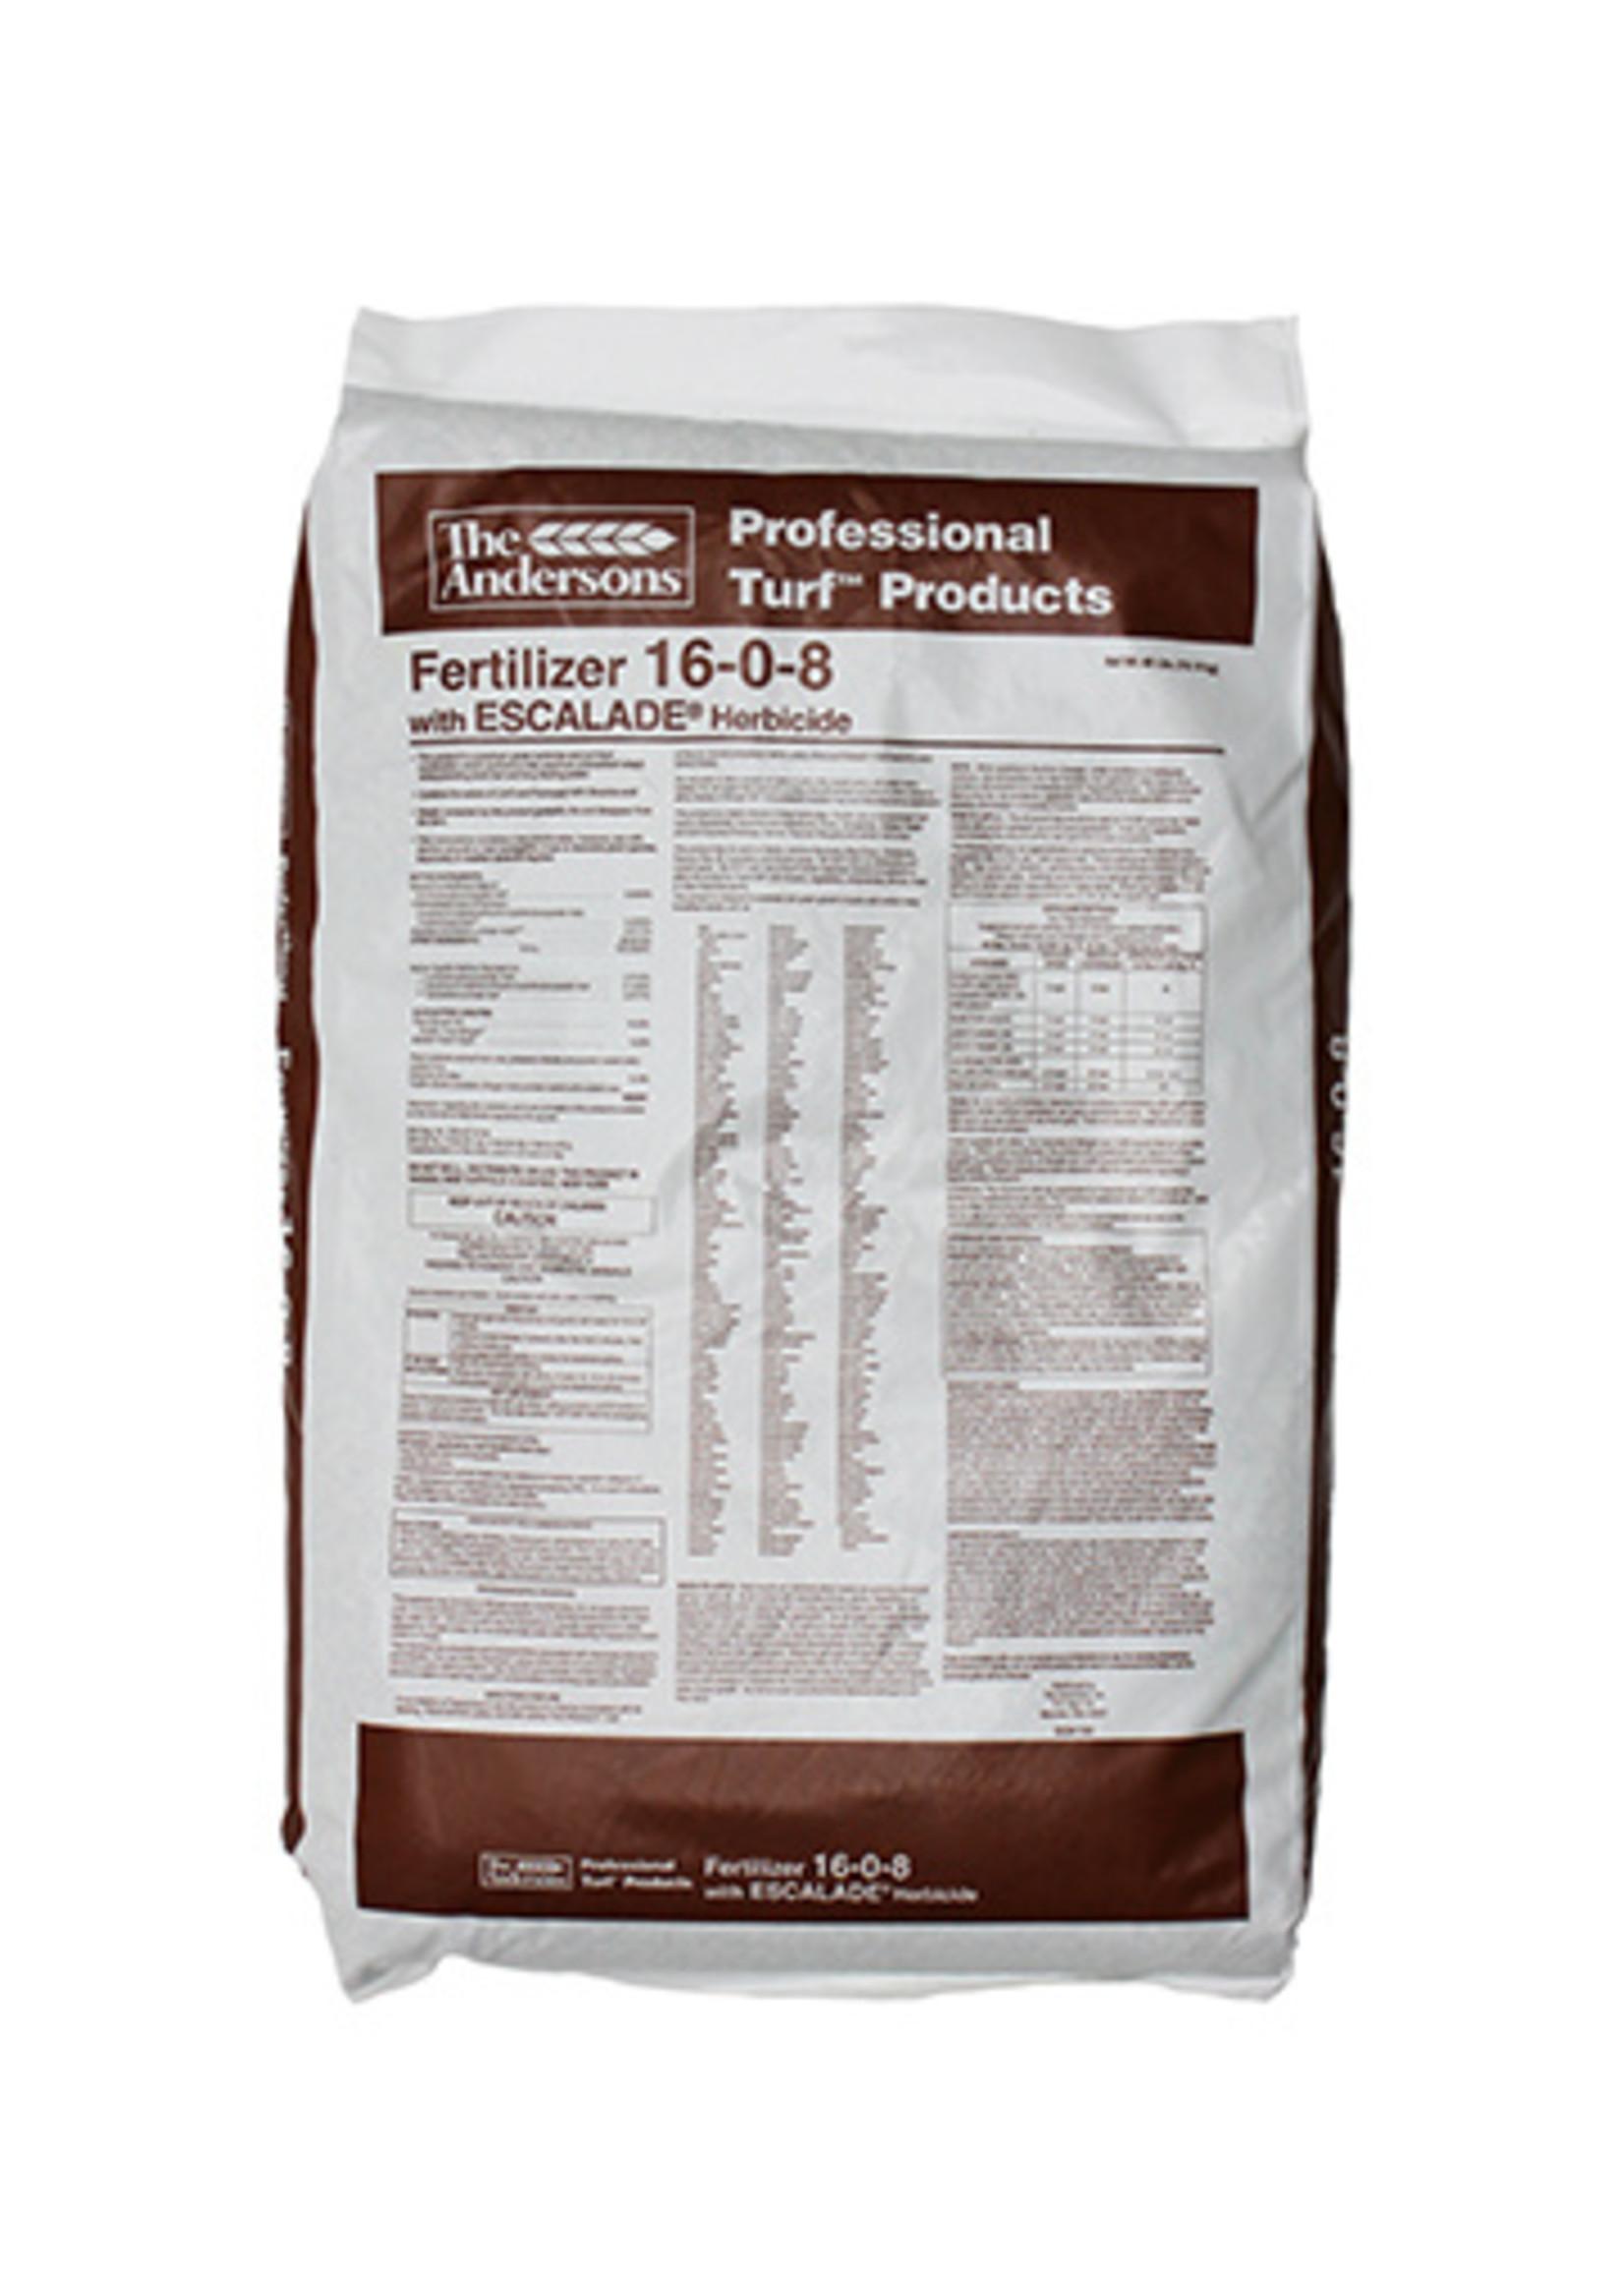 Andersons 16-0-8 Fertilizer with ESCALADE® Herbicide